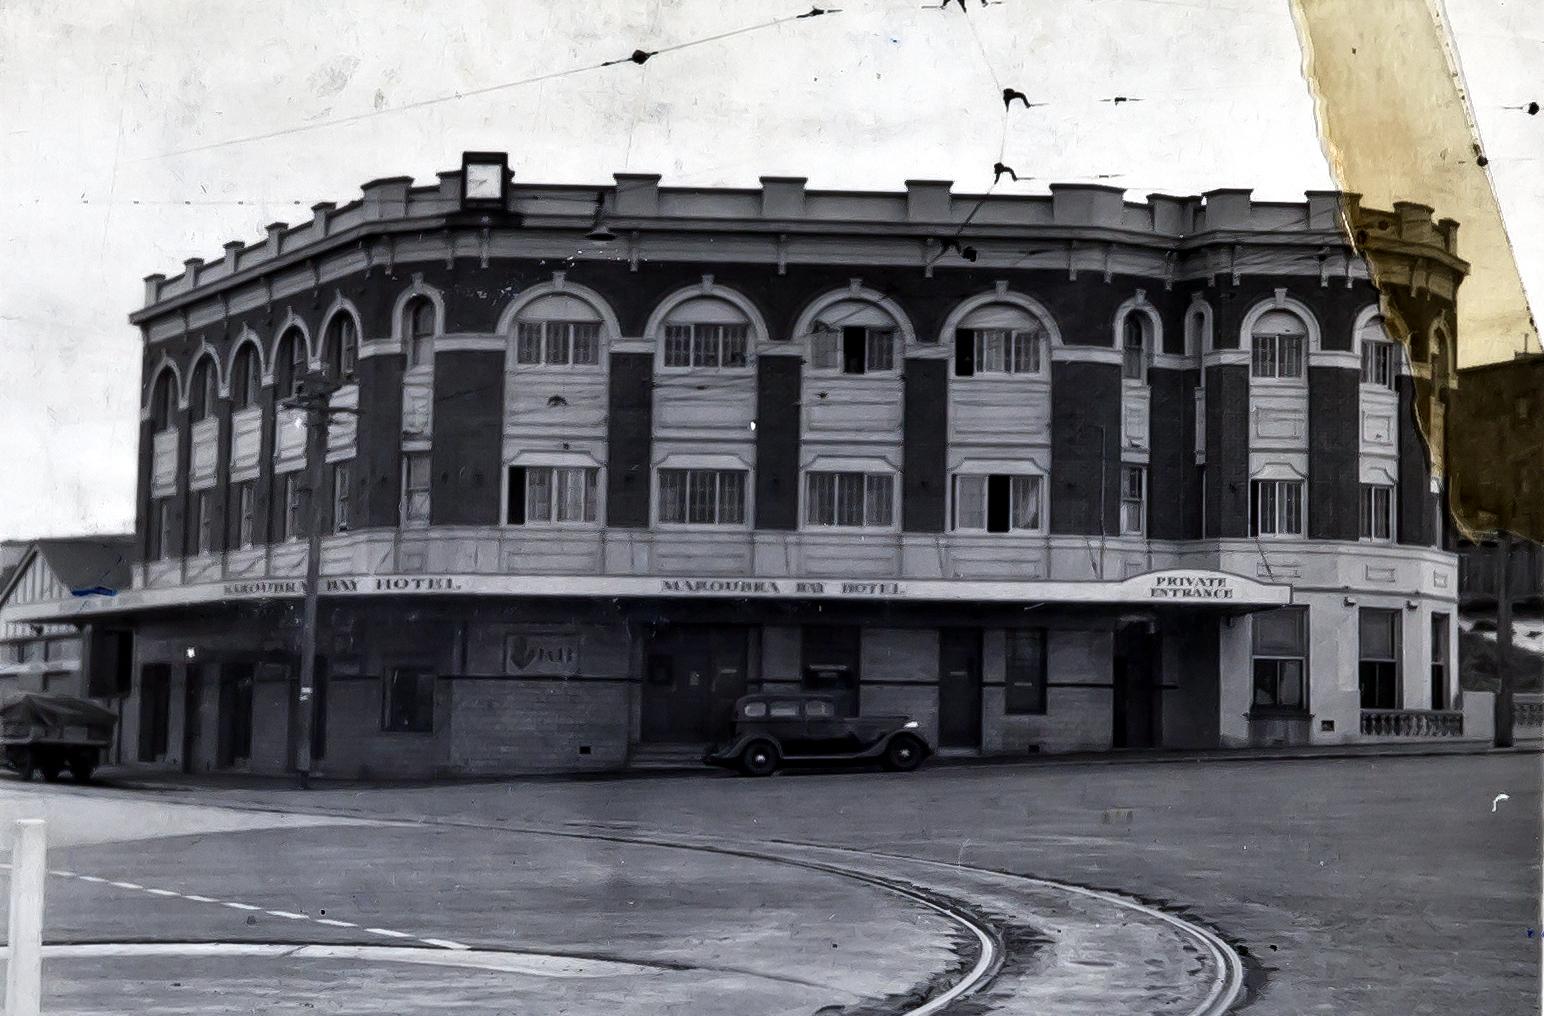 Maroubra Bay Hotel, Maroubra